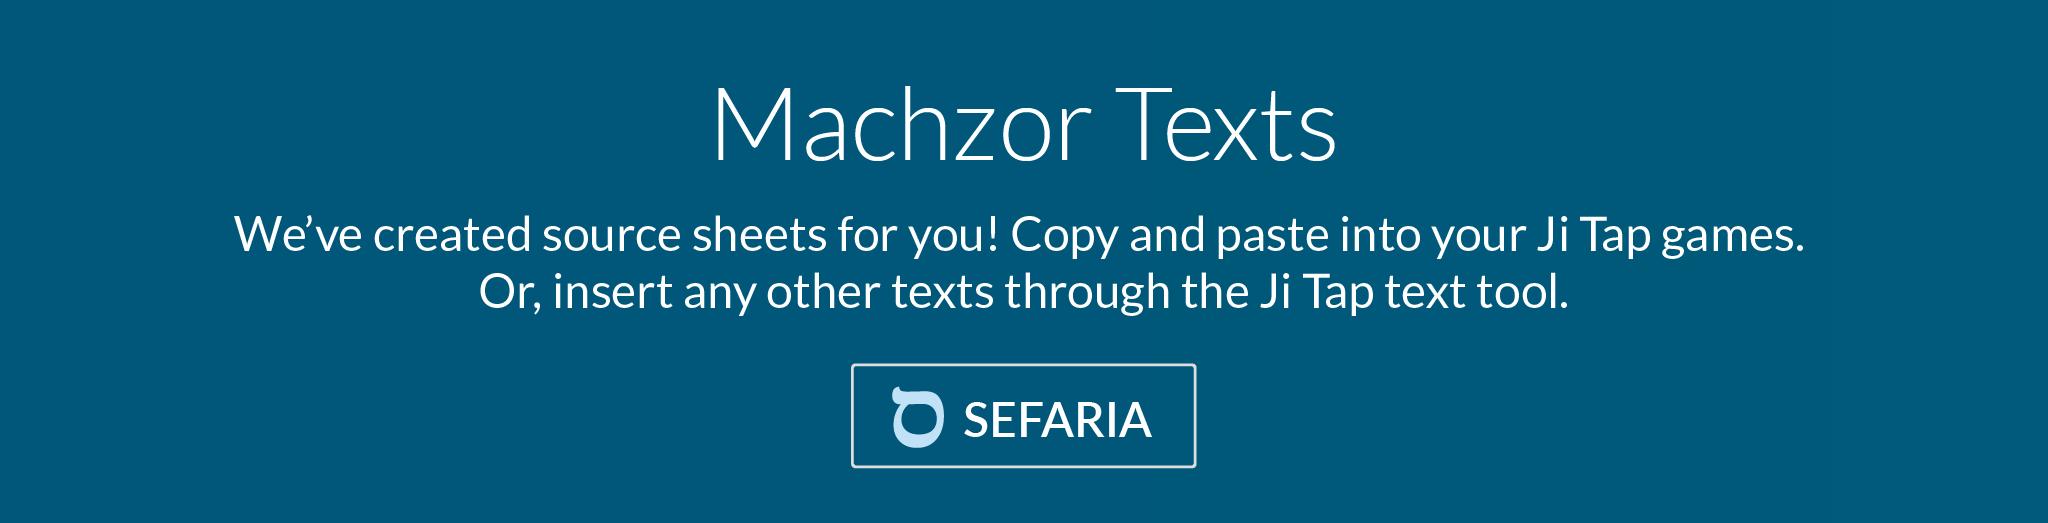 machzor texts